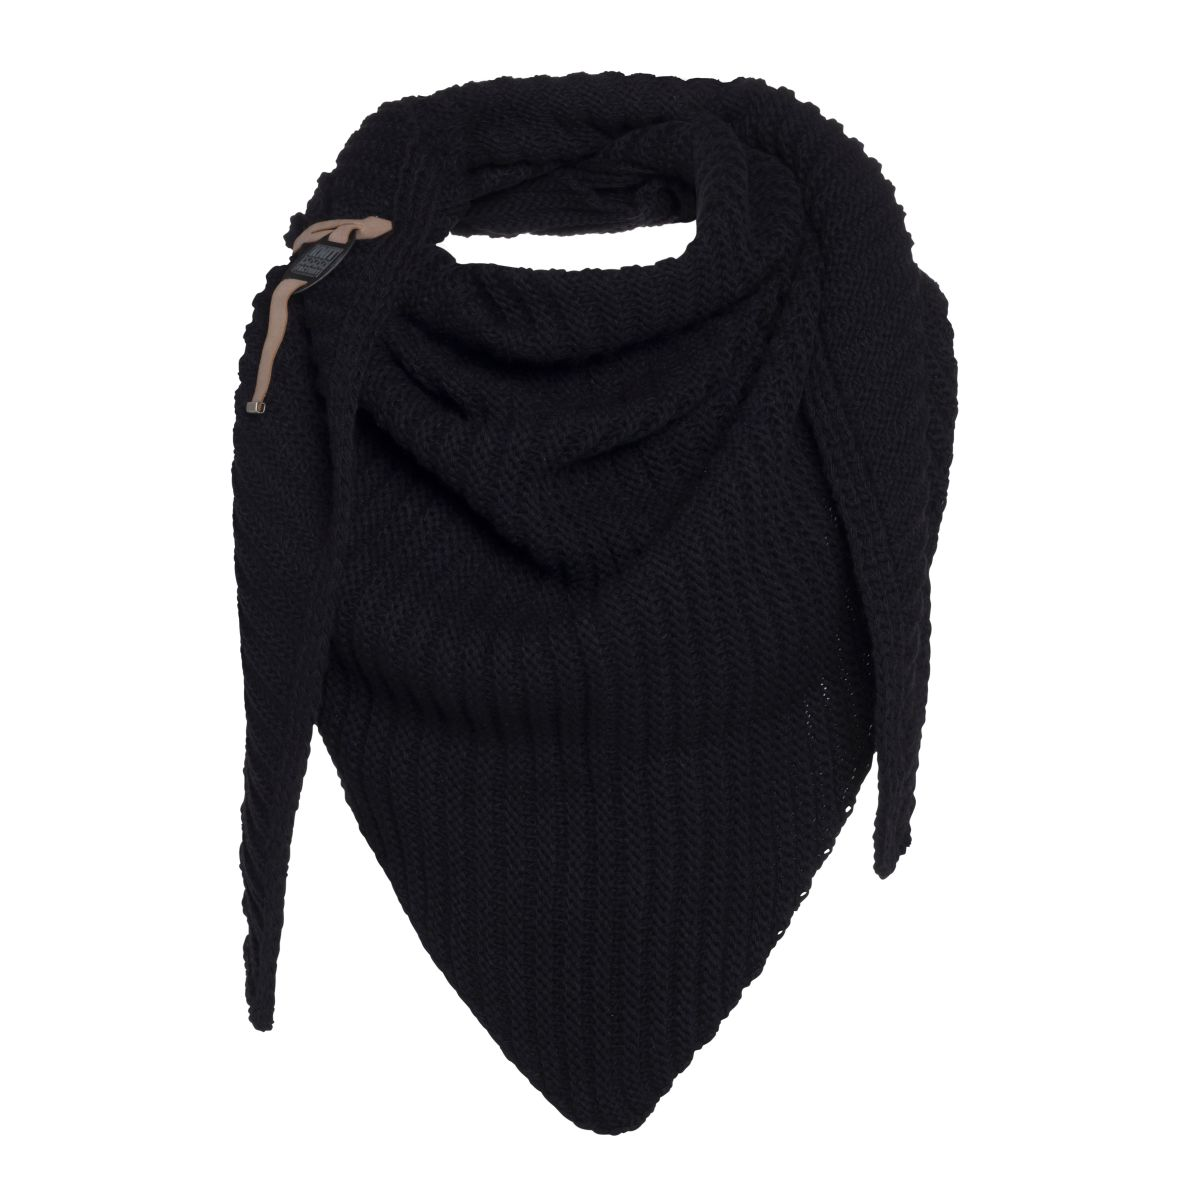 knit factory kf14706000050 demy omslagdoek zwart 1